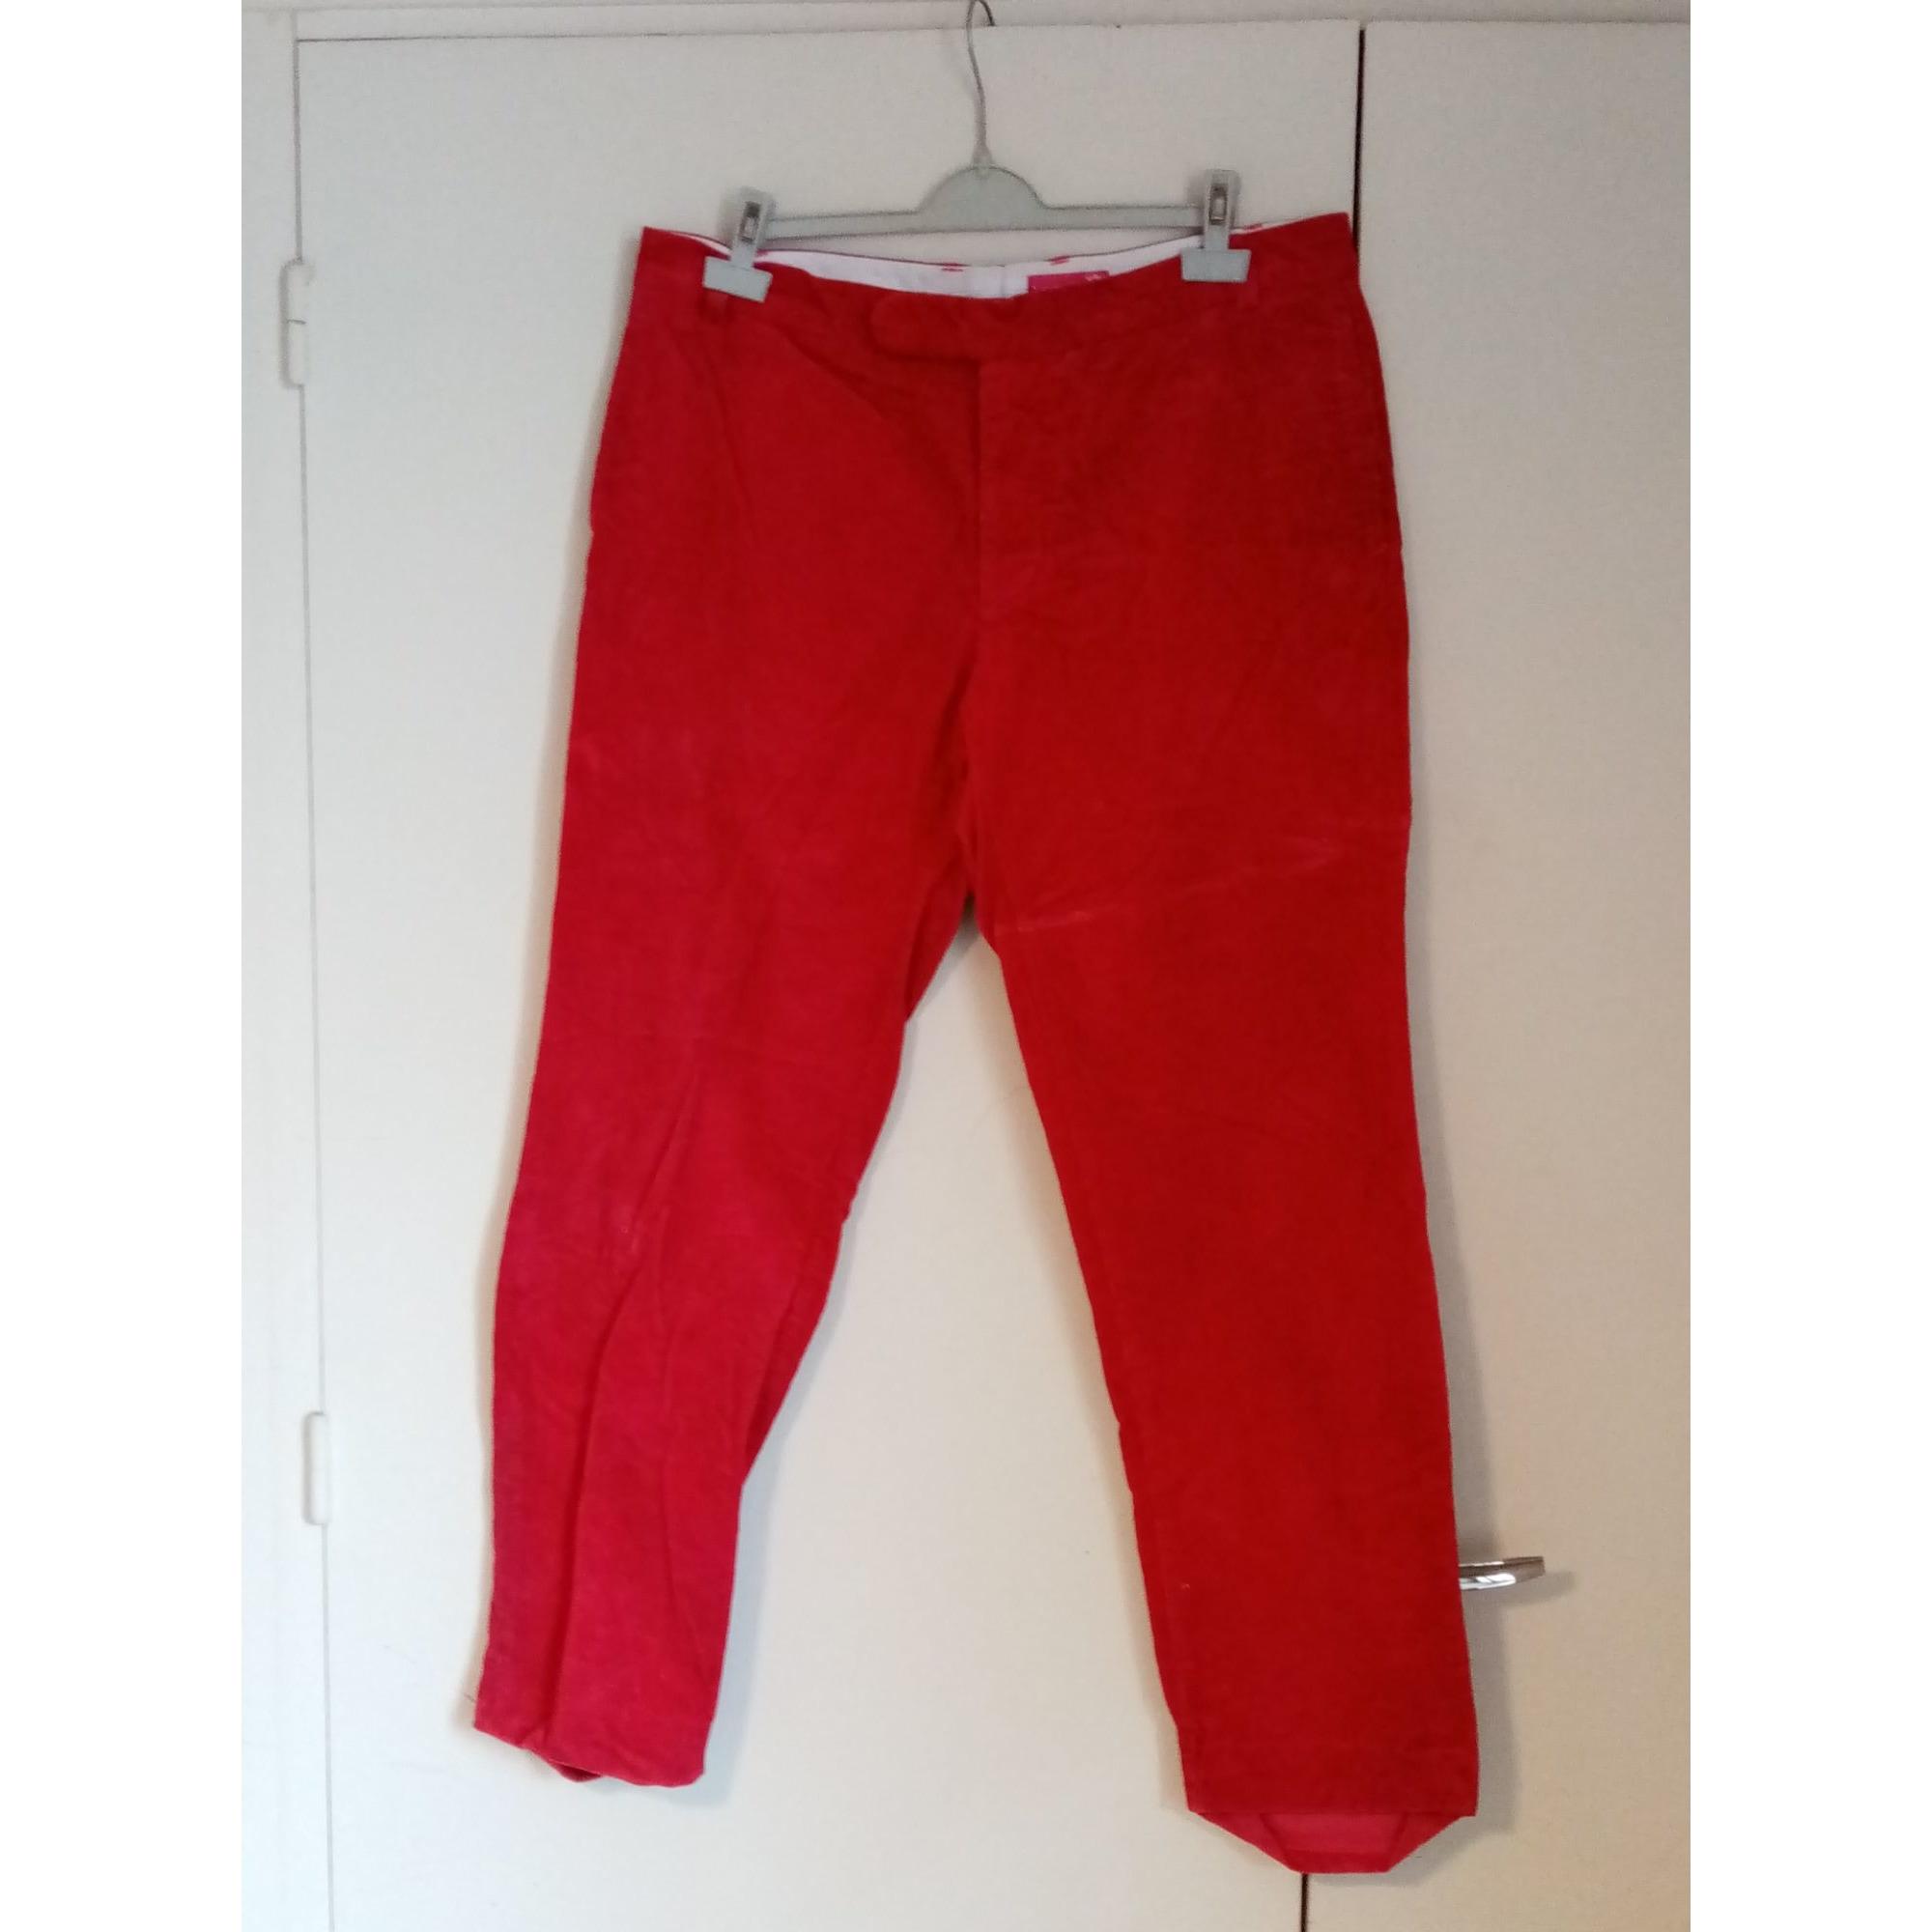 Pantalon droit VICOMTE A. Rose, fuschia, vieux rose